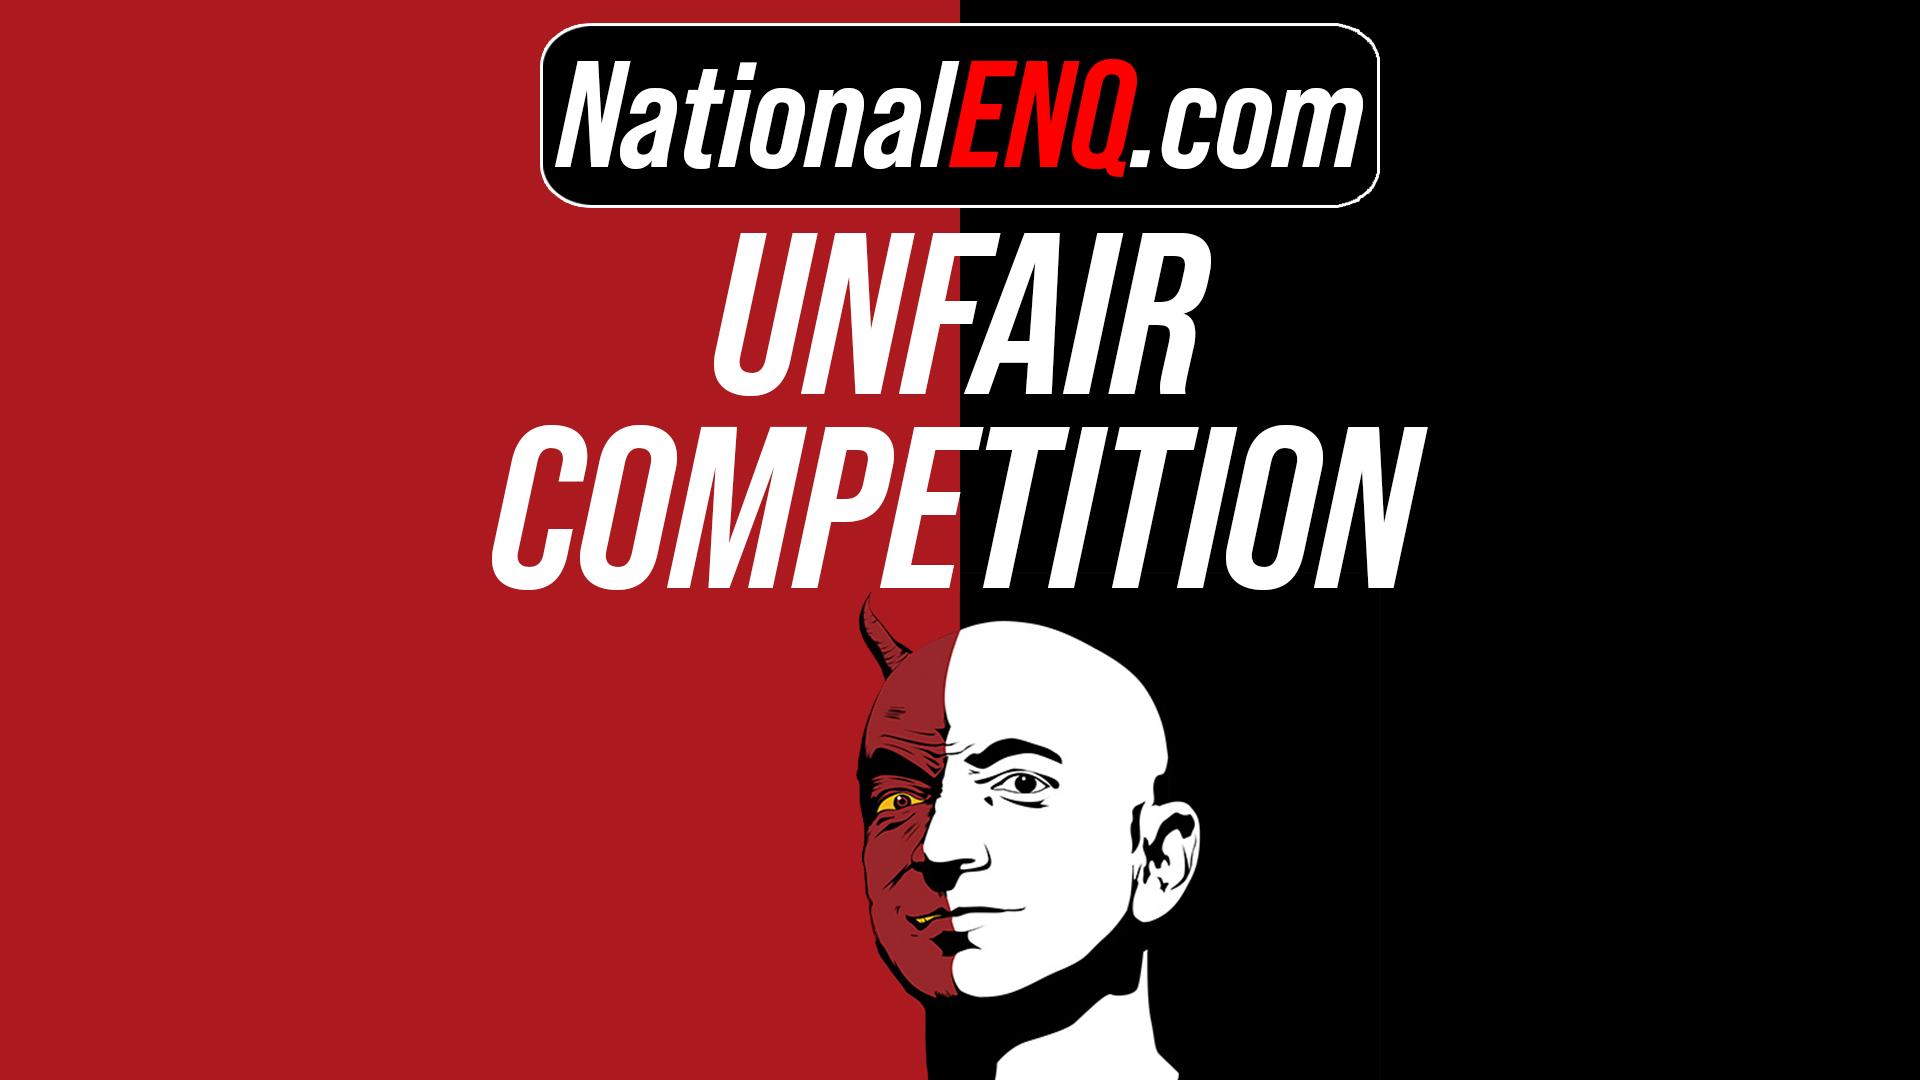 National ENQ News: Unfair Competition, Amazon Versus American Export Import – U.S. Congress Inquiry